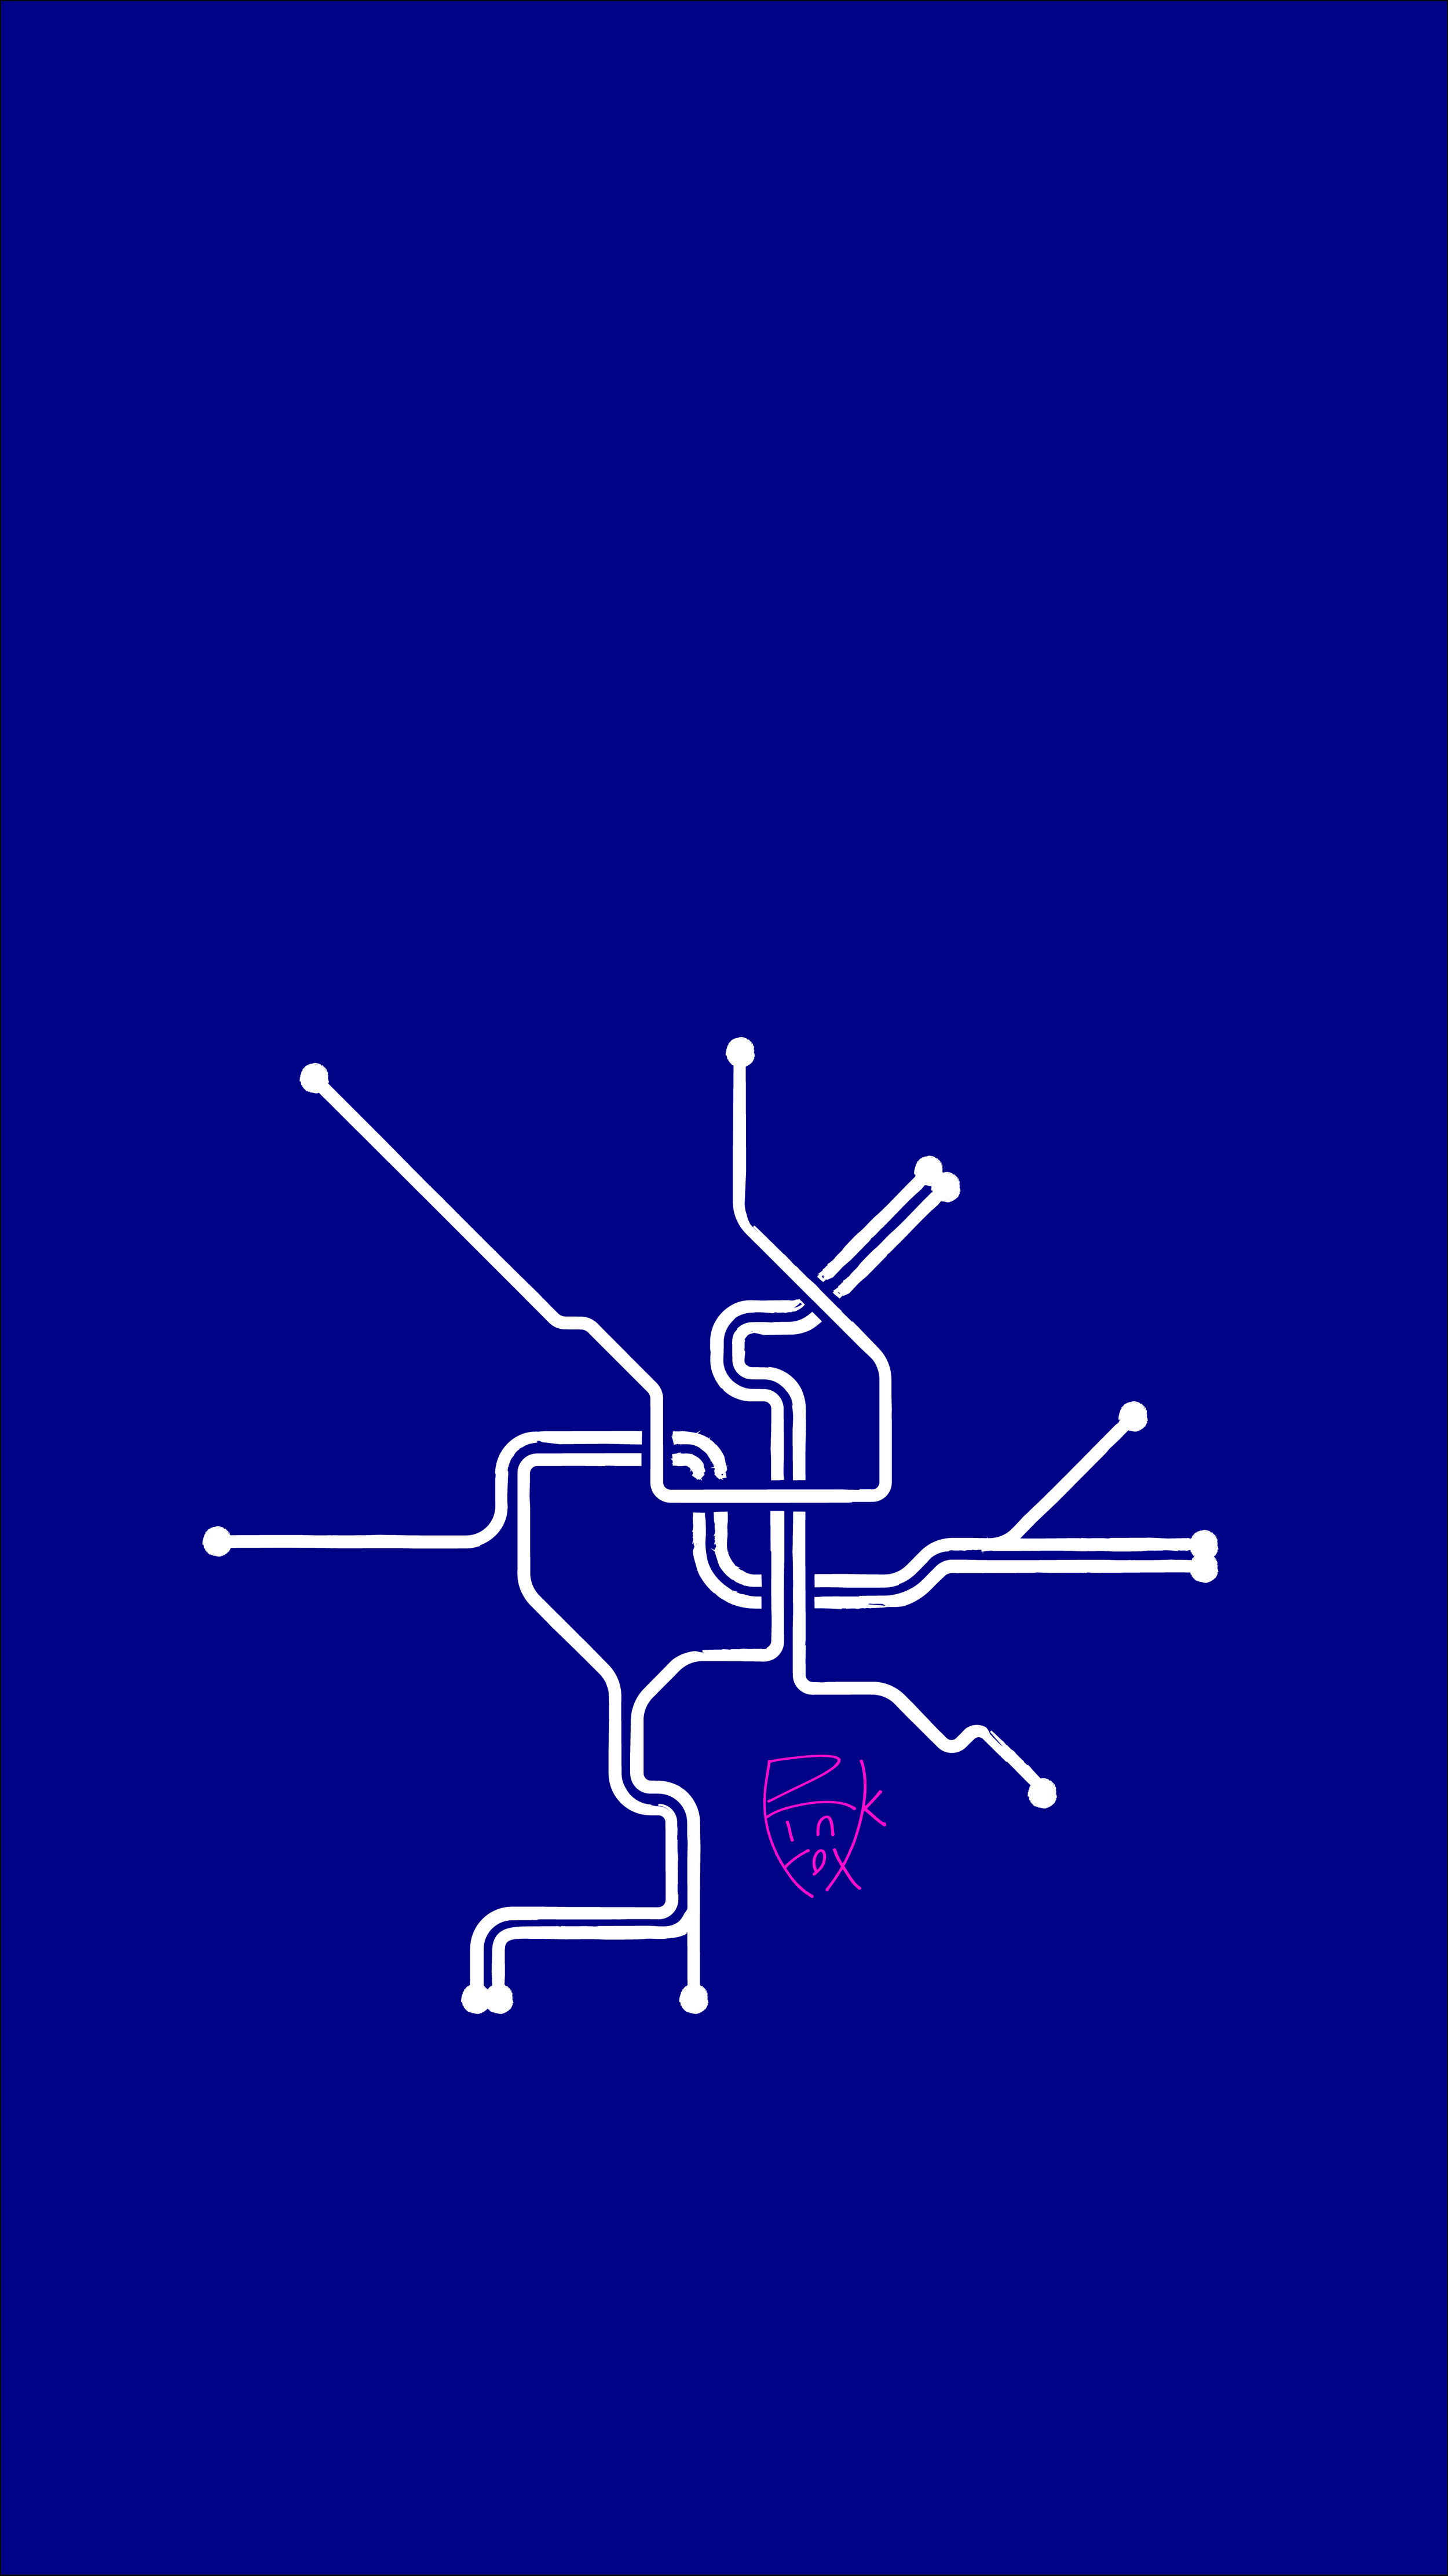 iPhone 8 BG - Metro Navy Blue.jpg